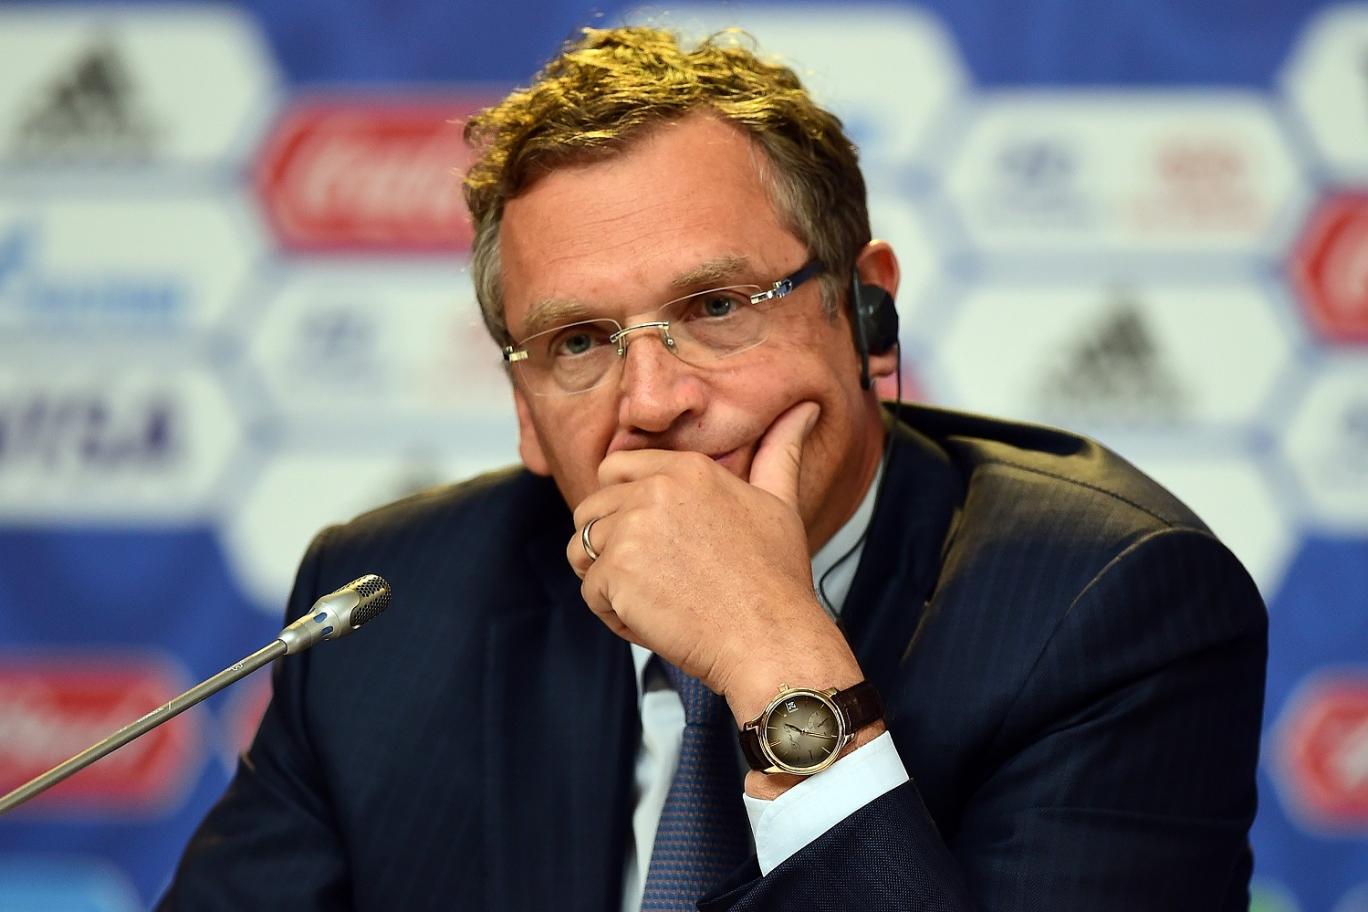 FIFA general secretary Jerome Valcke